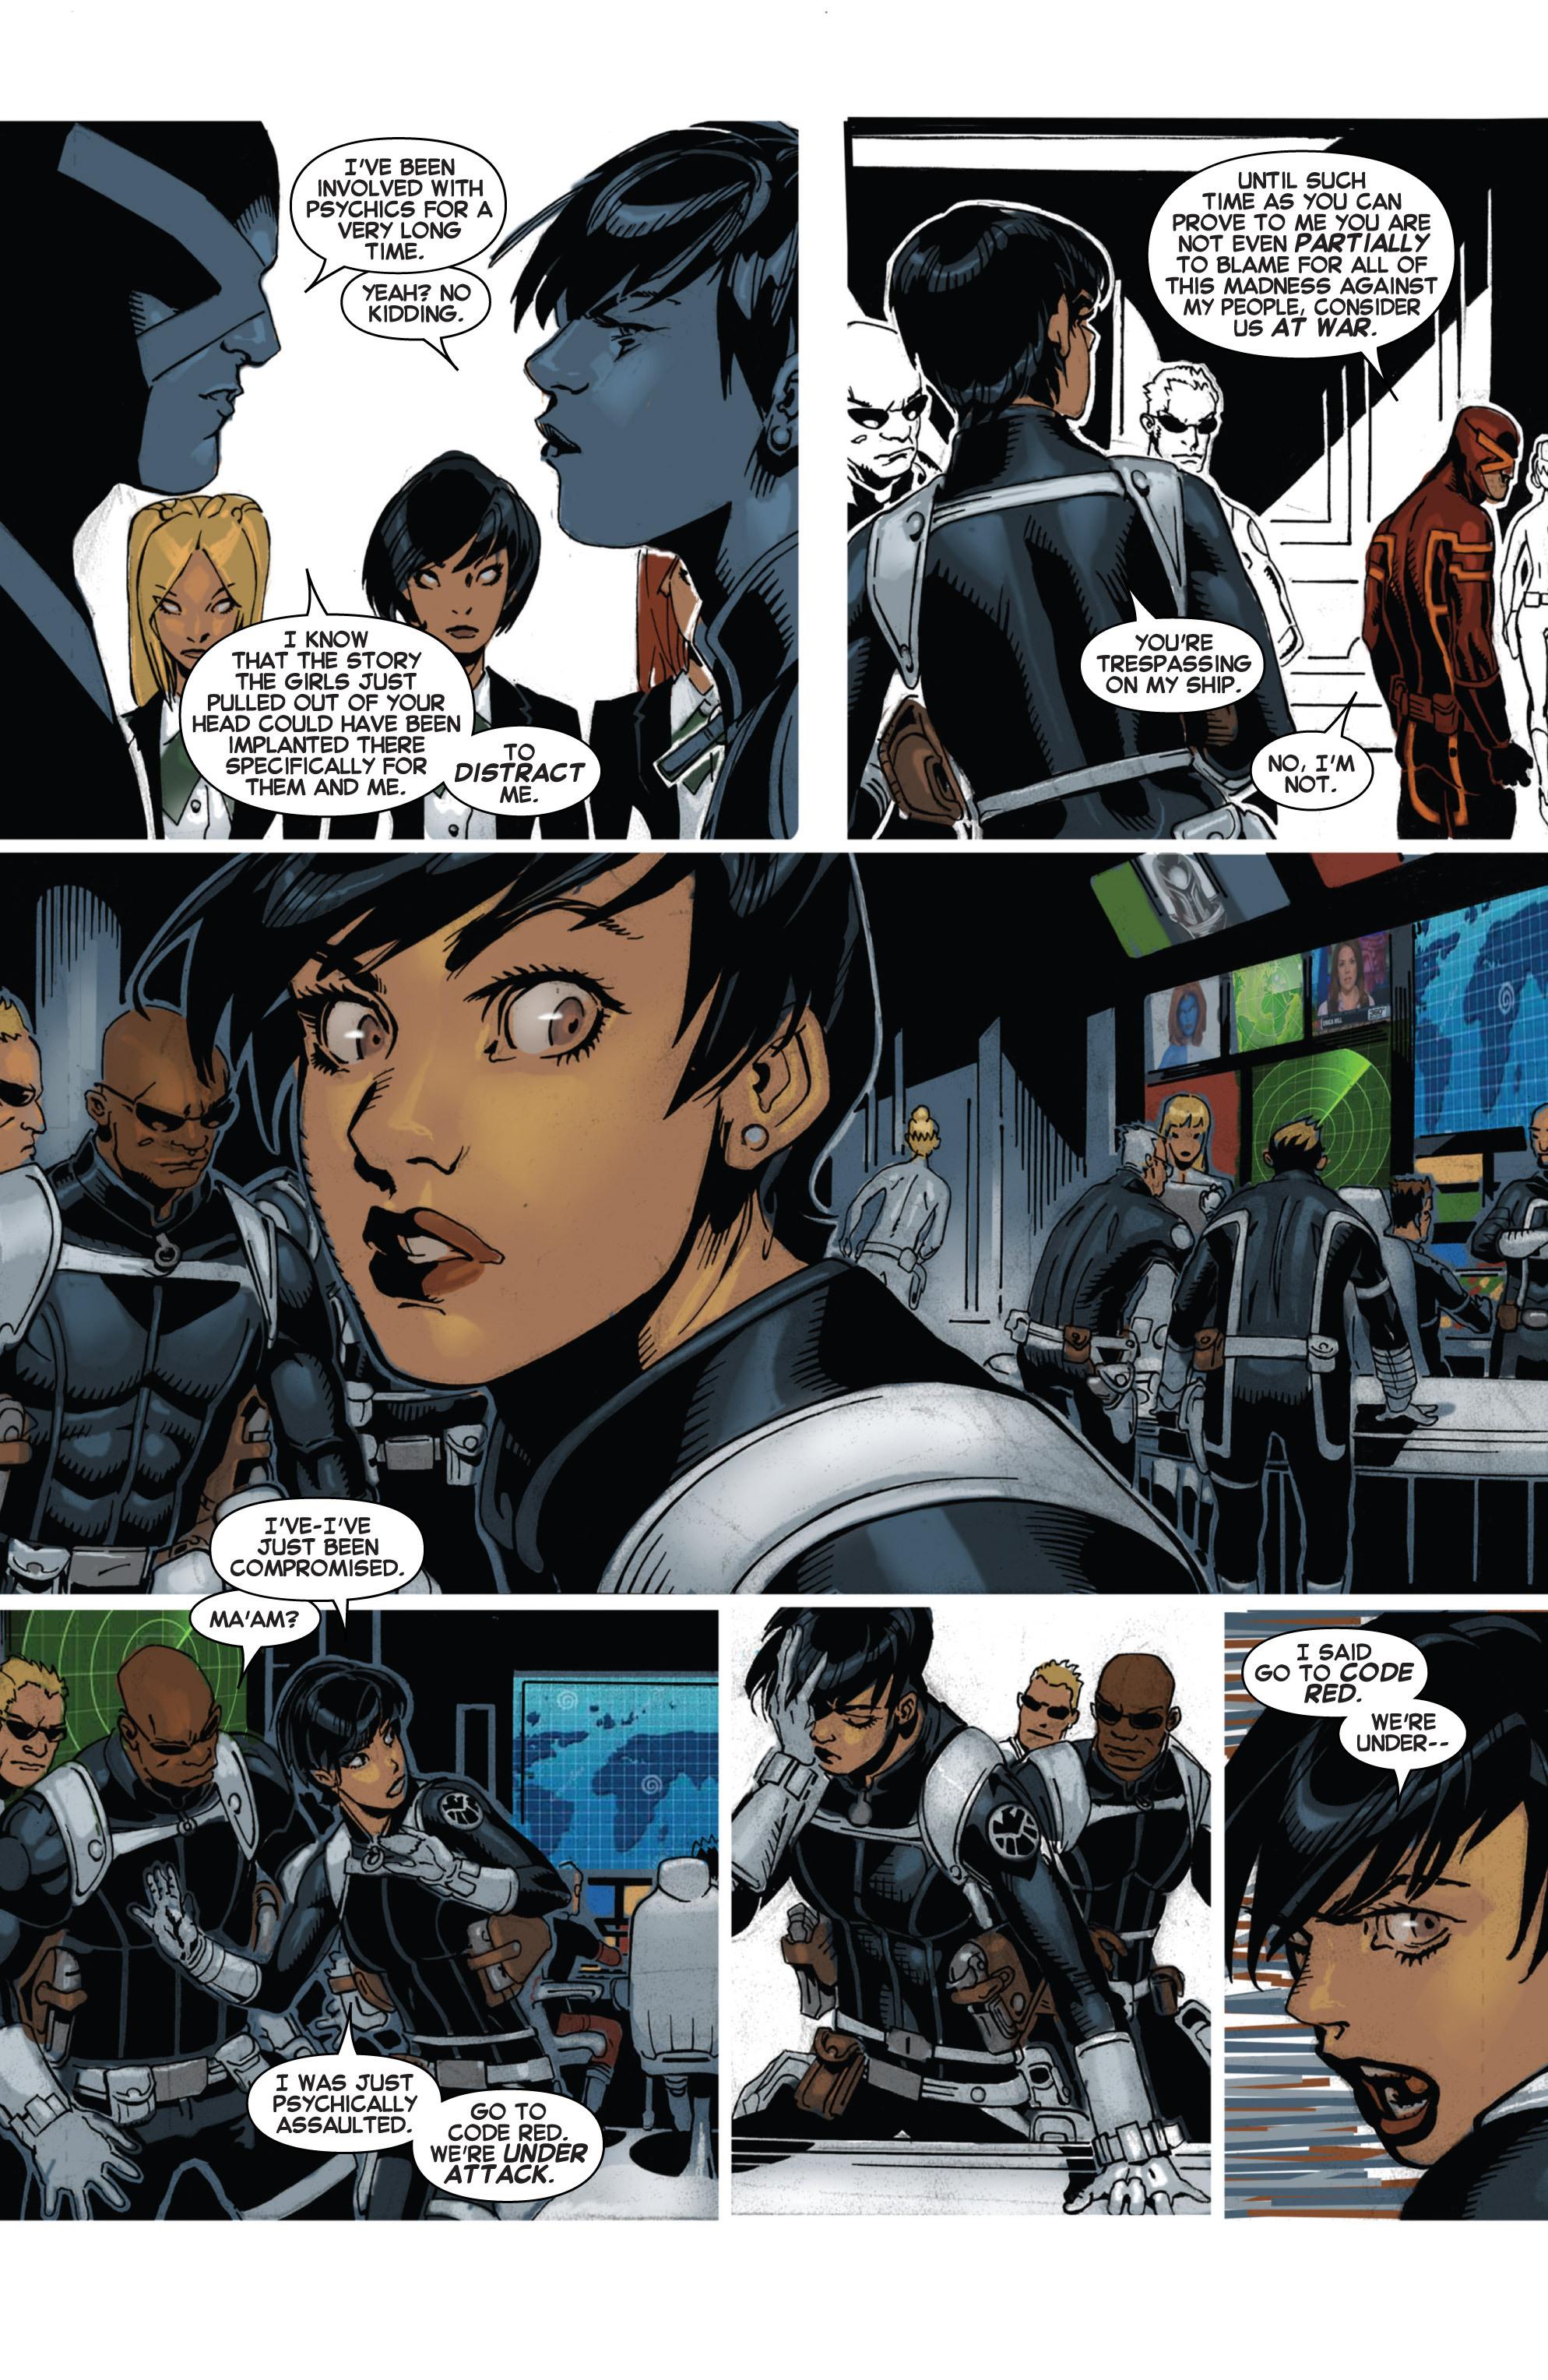 Read online Uncanny X-Men (2013) comic -  Issue # _TPB 4 - vs. S.H.I.E.L.D - 27